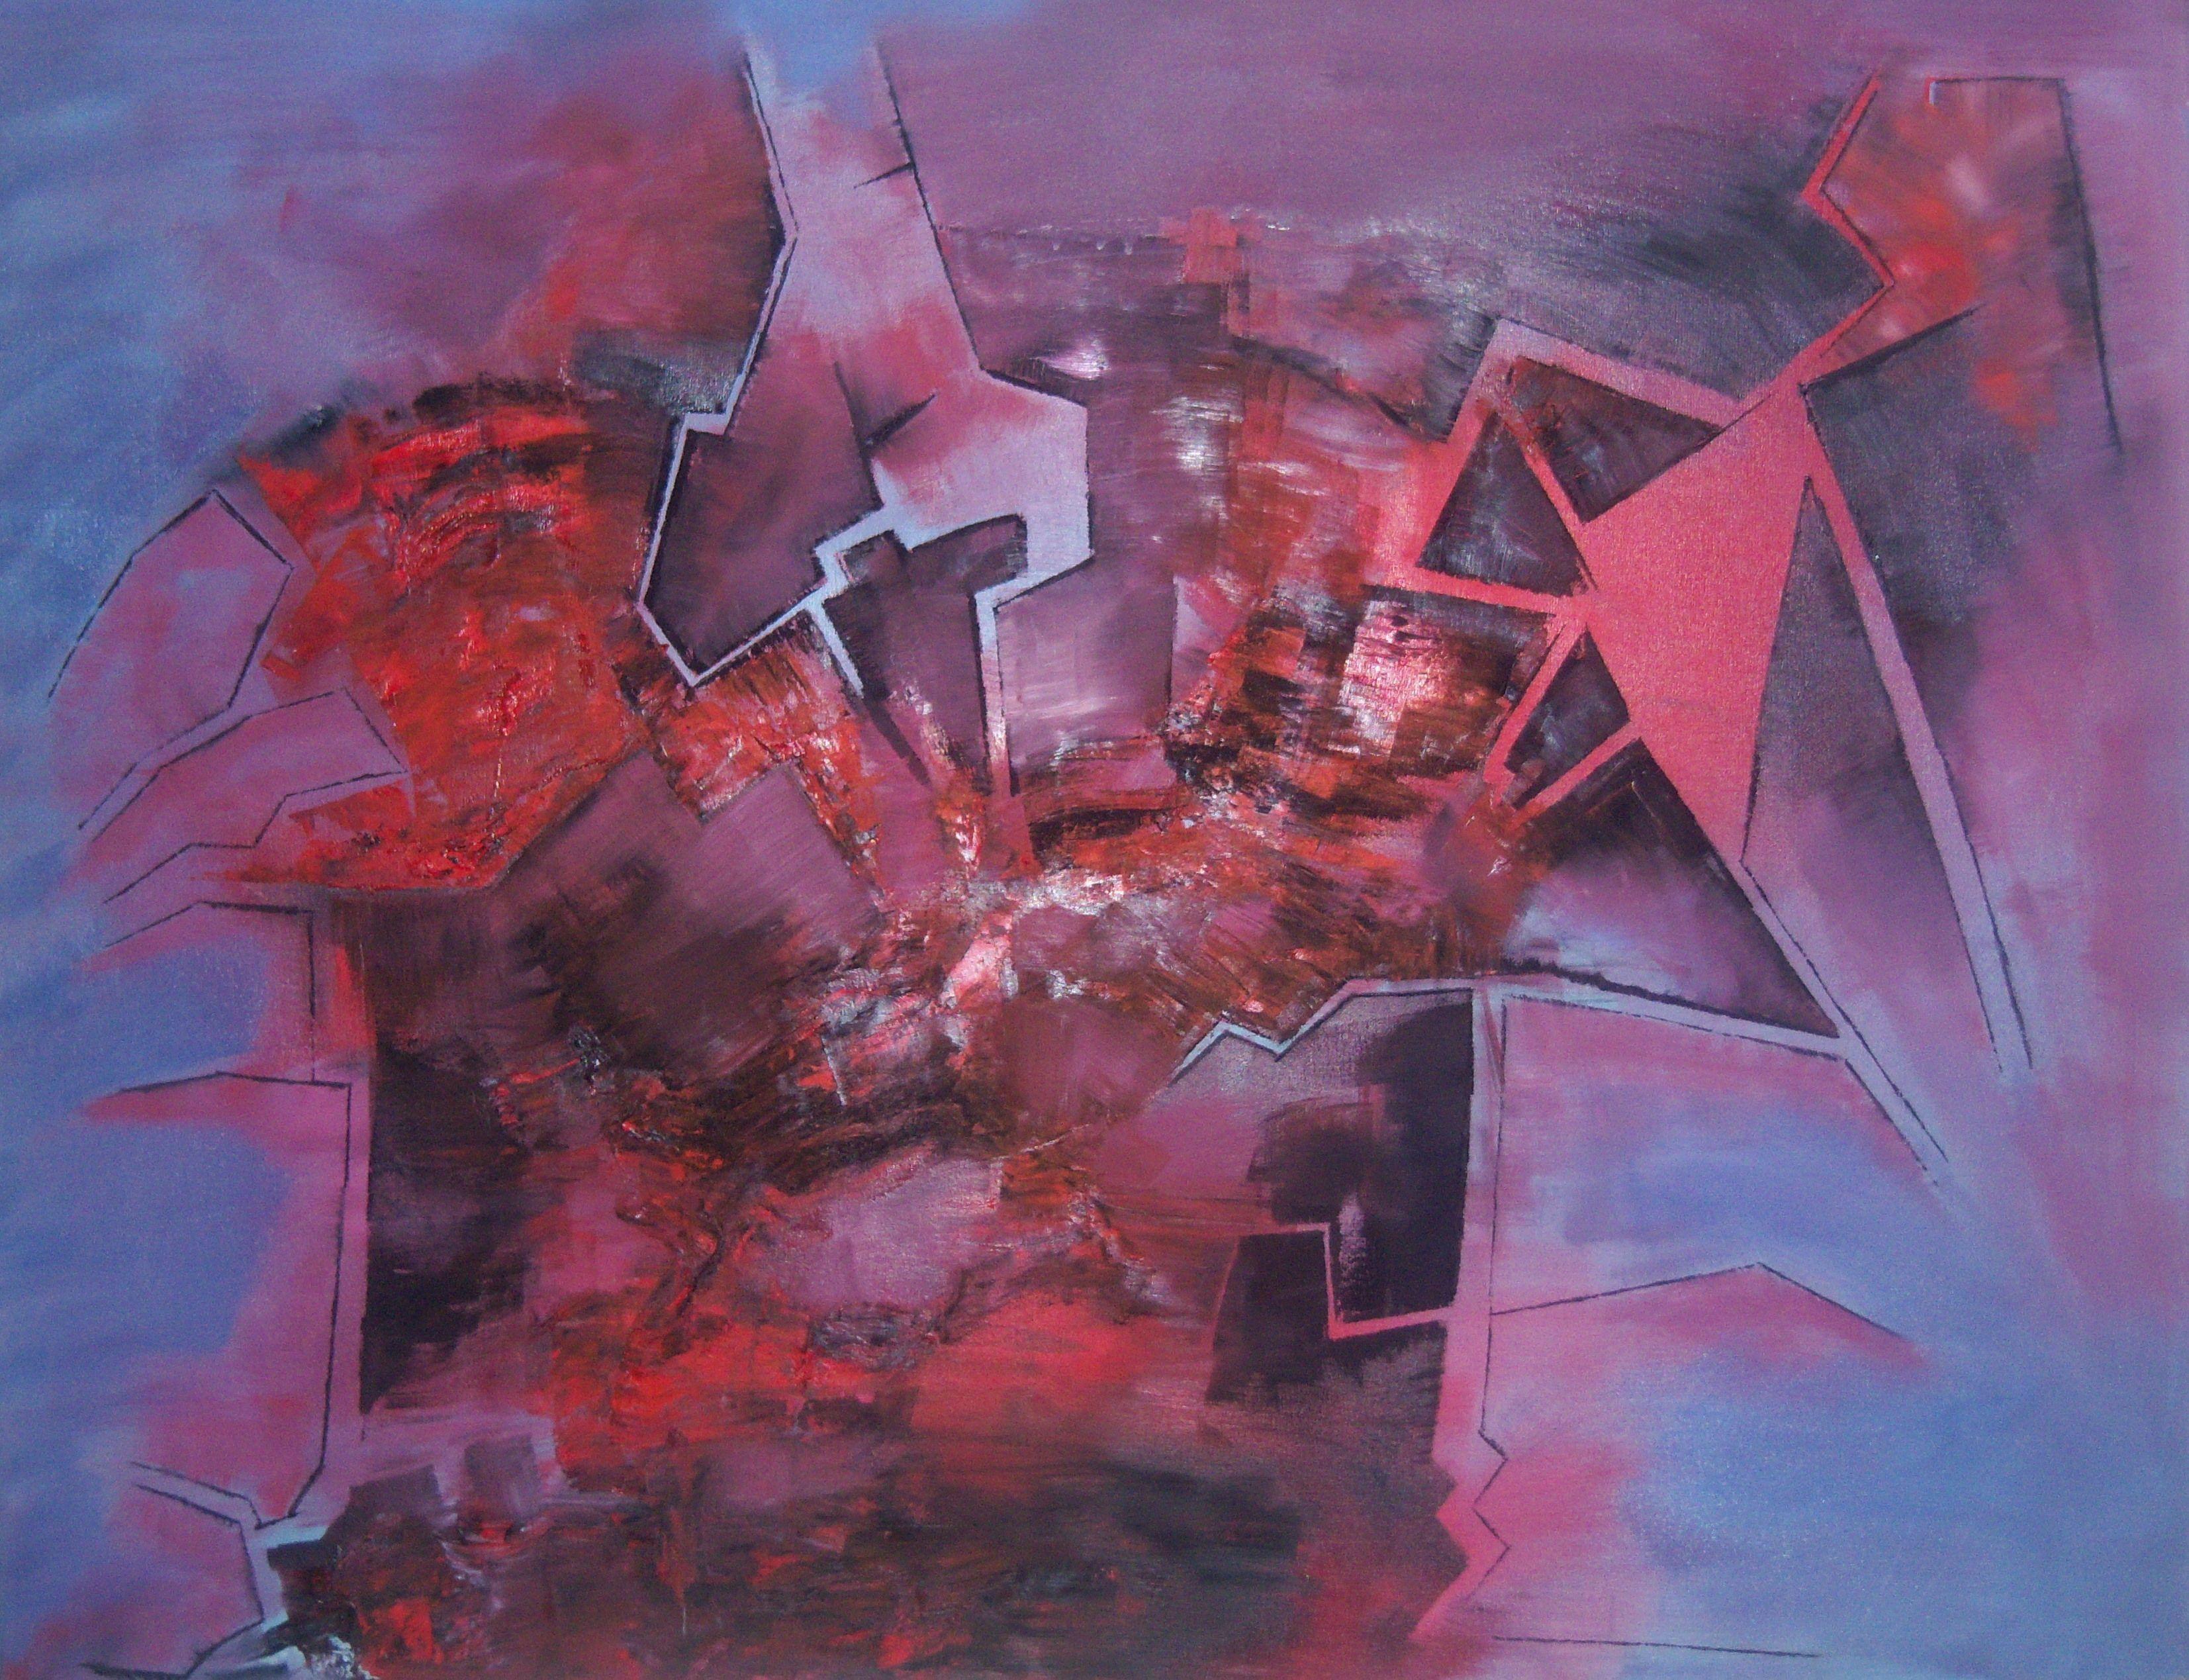 """Encrucijada"" - Fernando Gastron - Oleo sobre tela - 80 x 100 cm. - www.esencialismo.com"